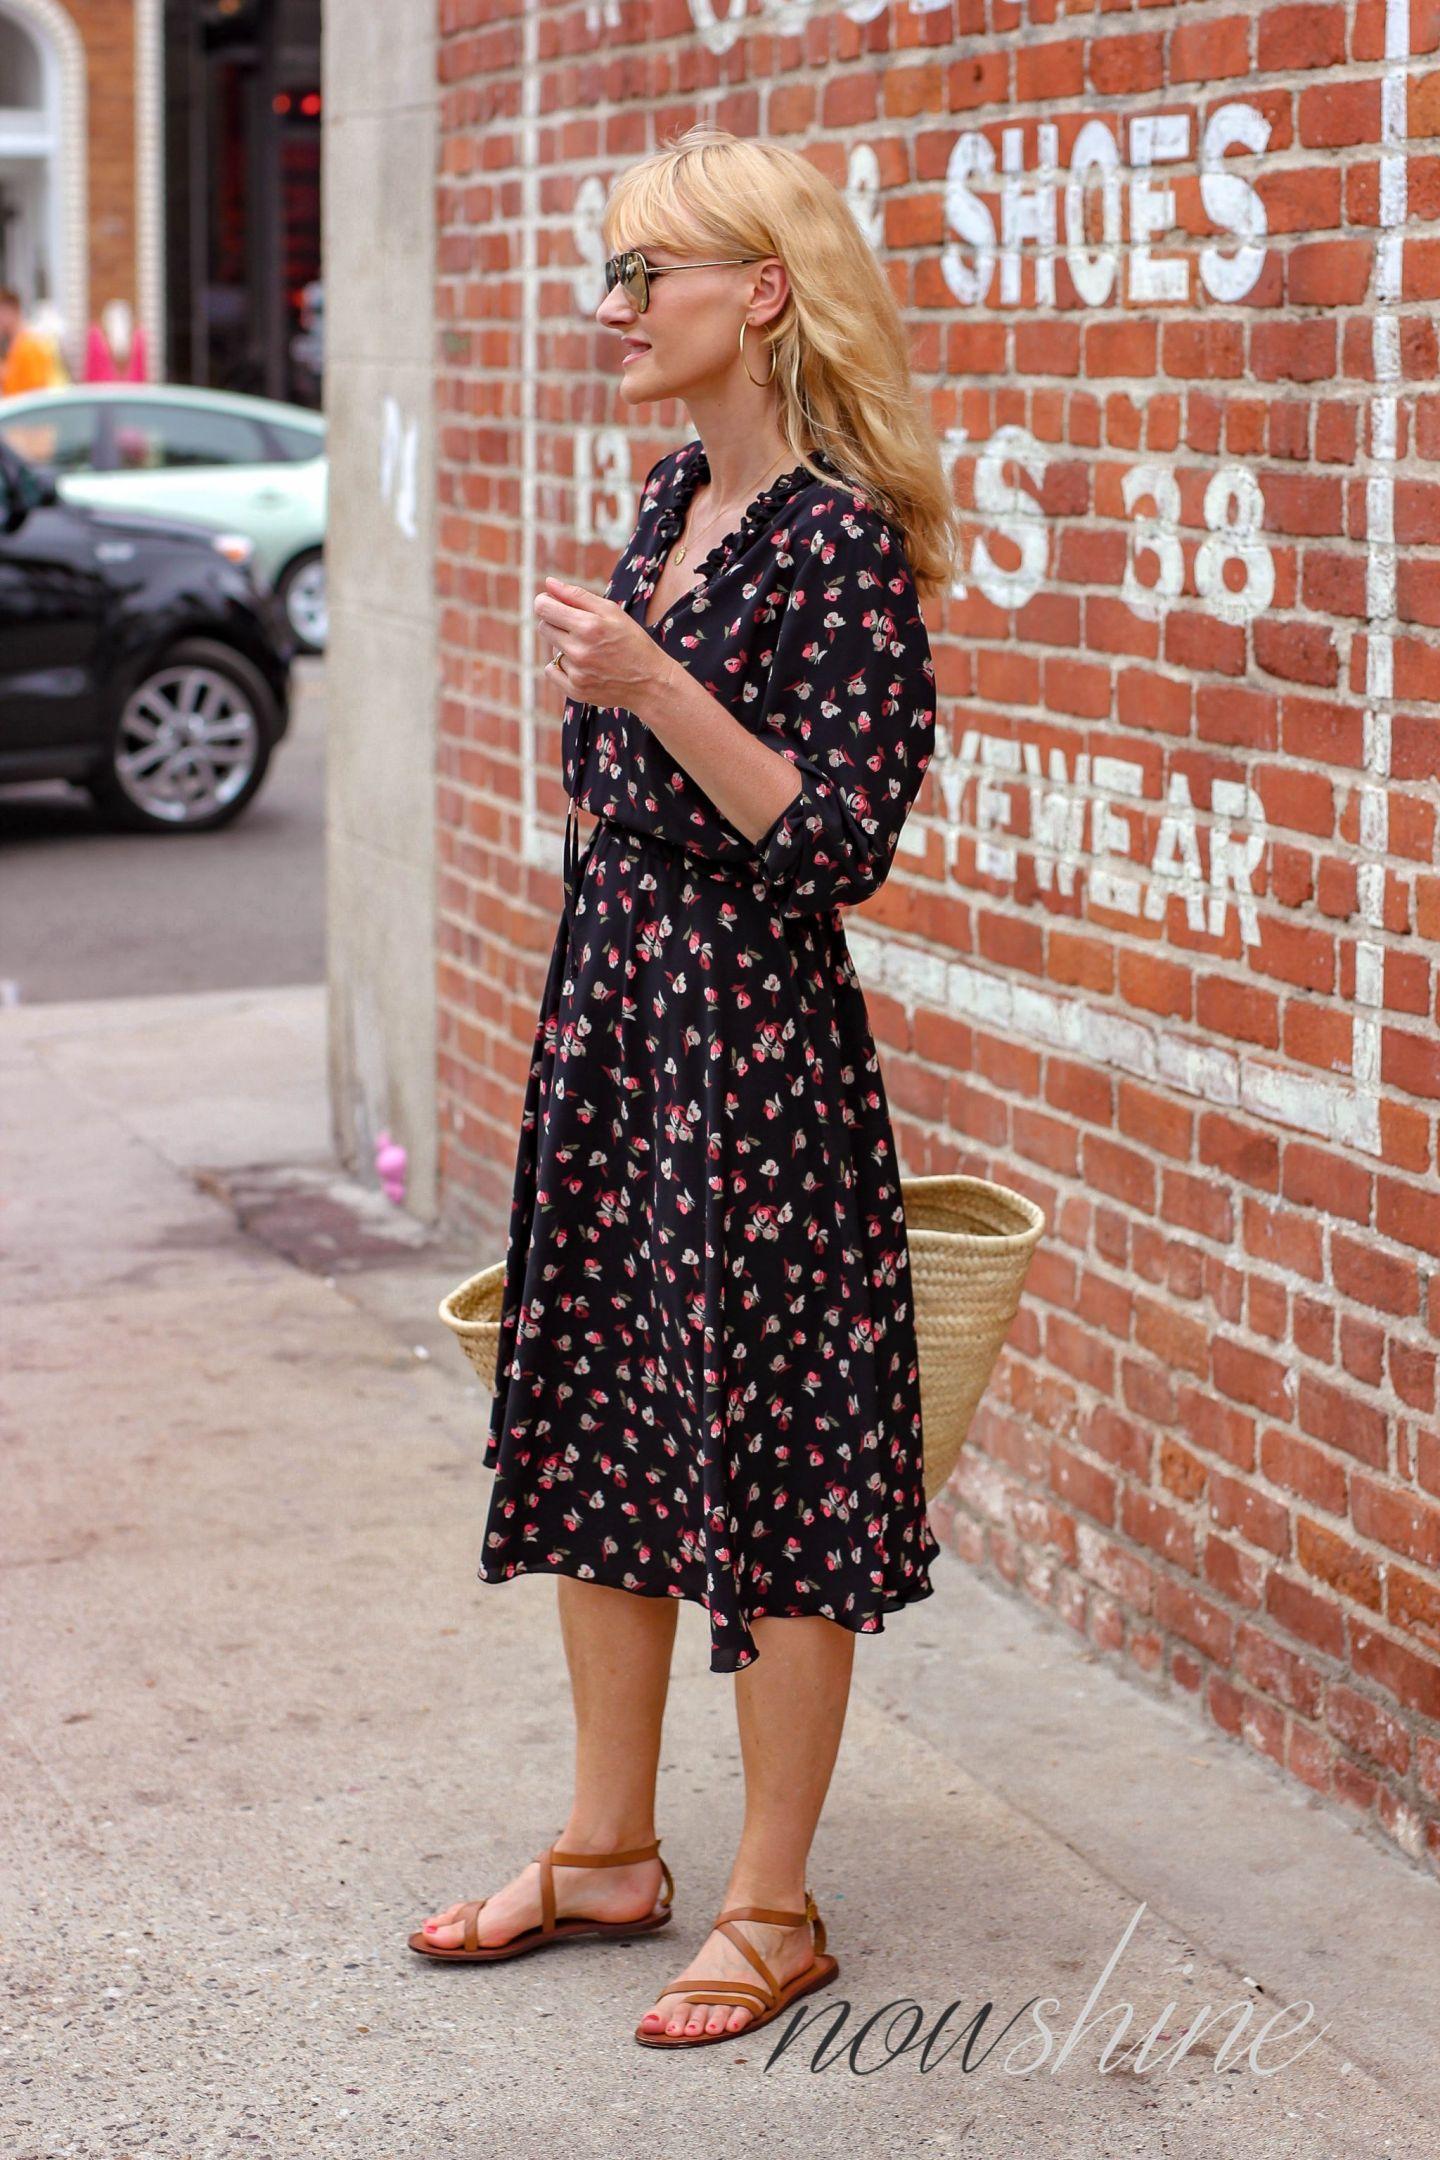 Aus dem WENZ Katalog -Cali Feeling Kleid mit Blumen -Nowshine ü 40 Mode